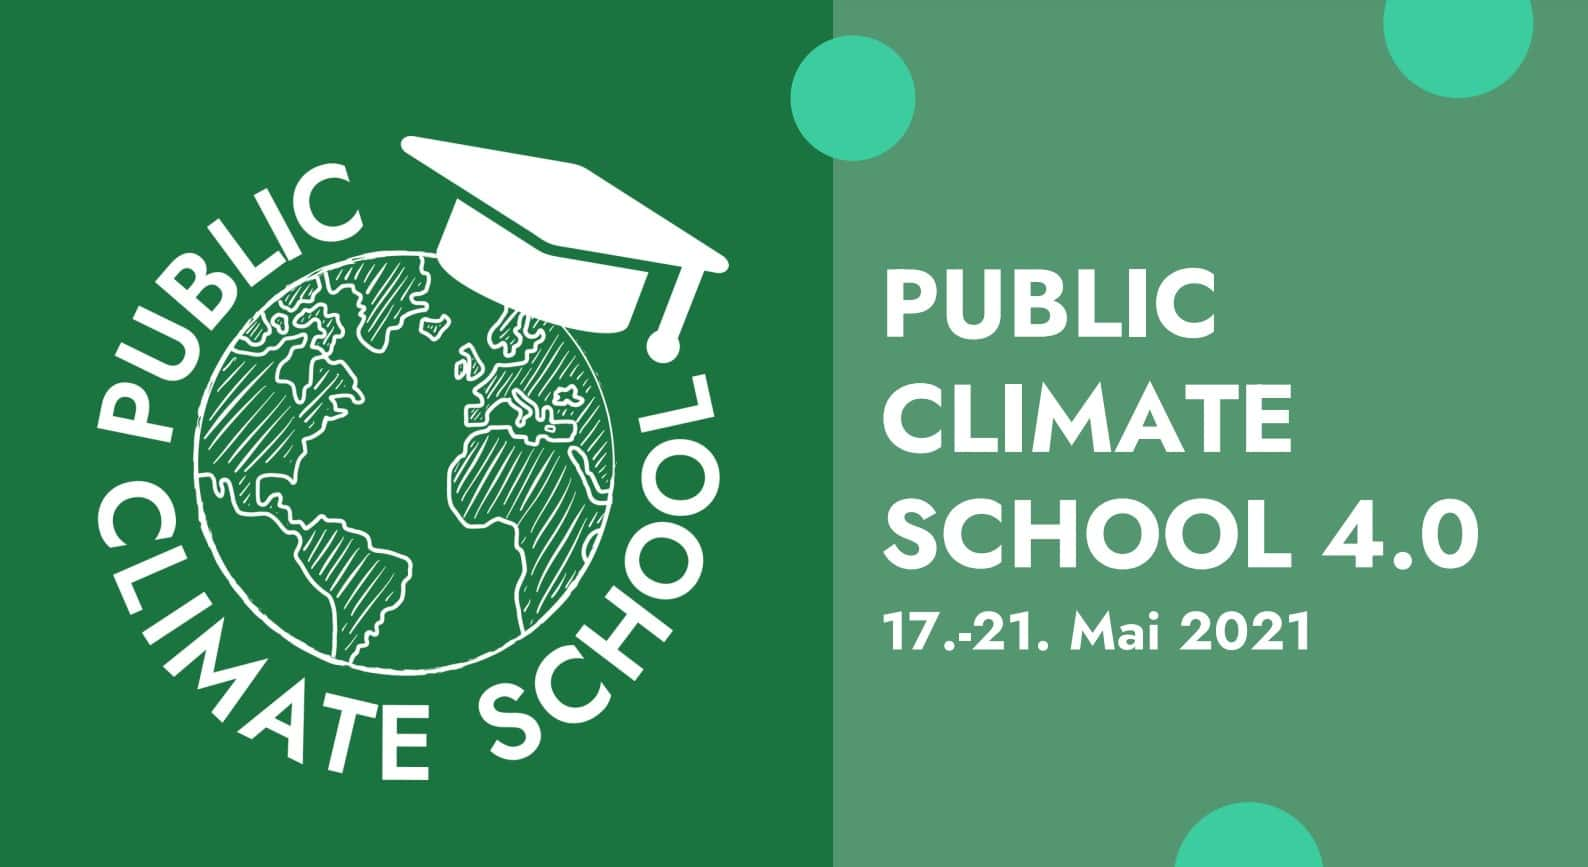 Wandel fängt mit Bildung an Public Climate School 4.0